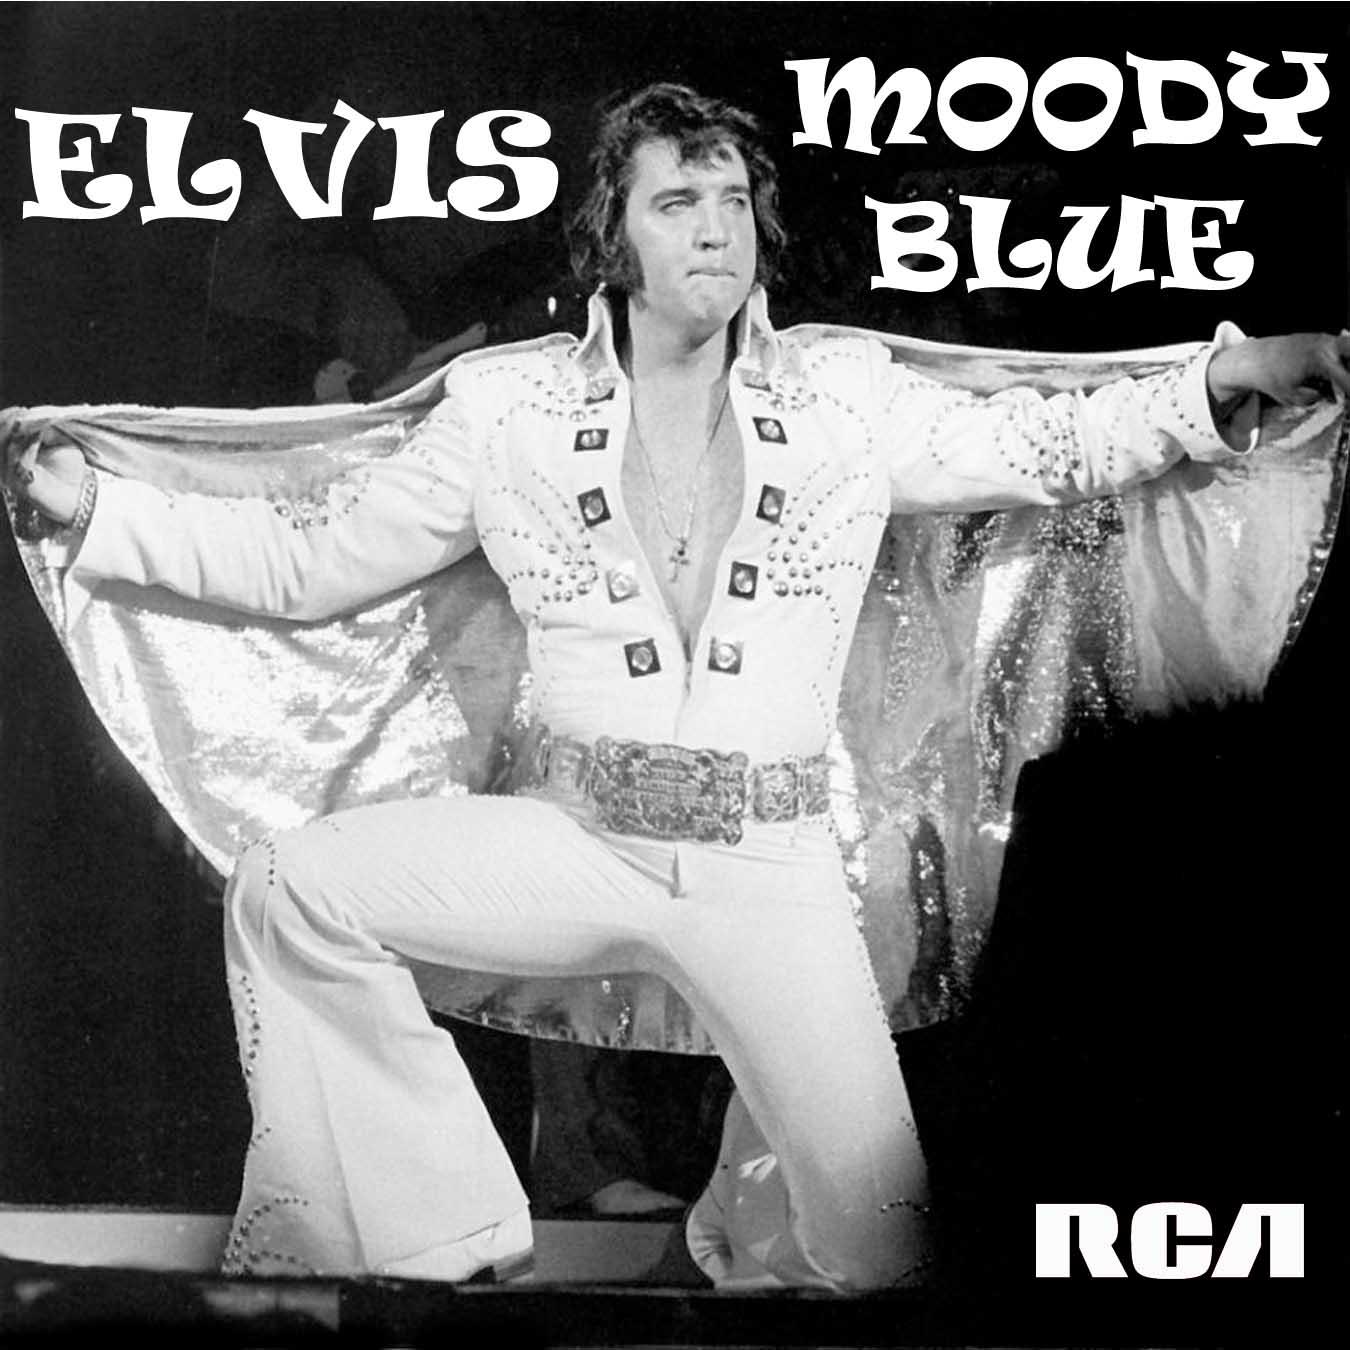 Curtis Wells: Elvis Presley's Last Album Cover